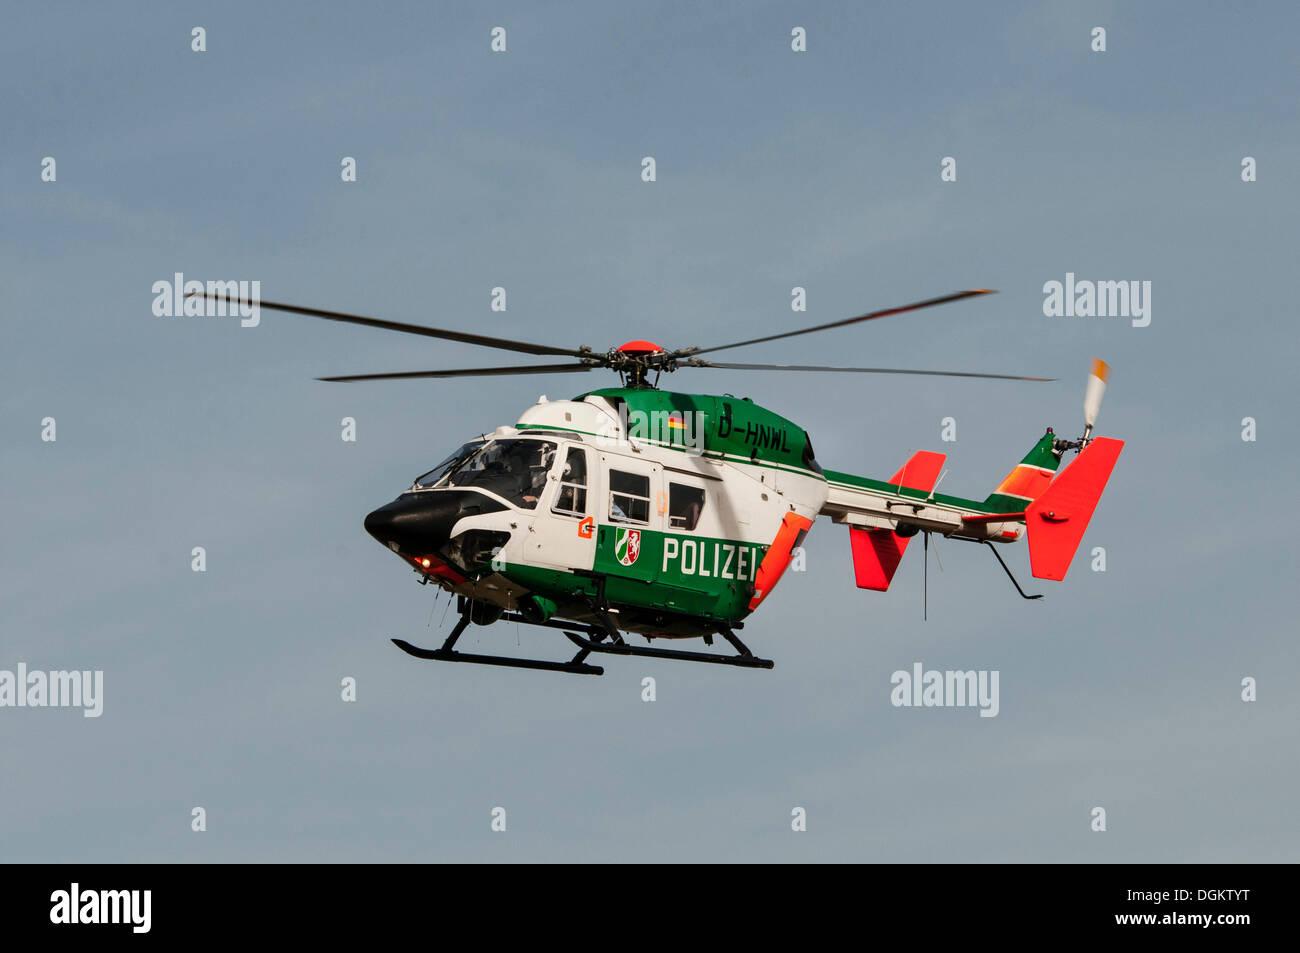 Police helicopter 'Hummel 9' in flight near Duesseldorf Airport, North Rhine-Westphalia - Stock Image